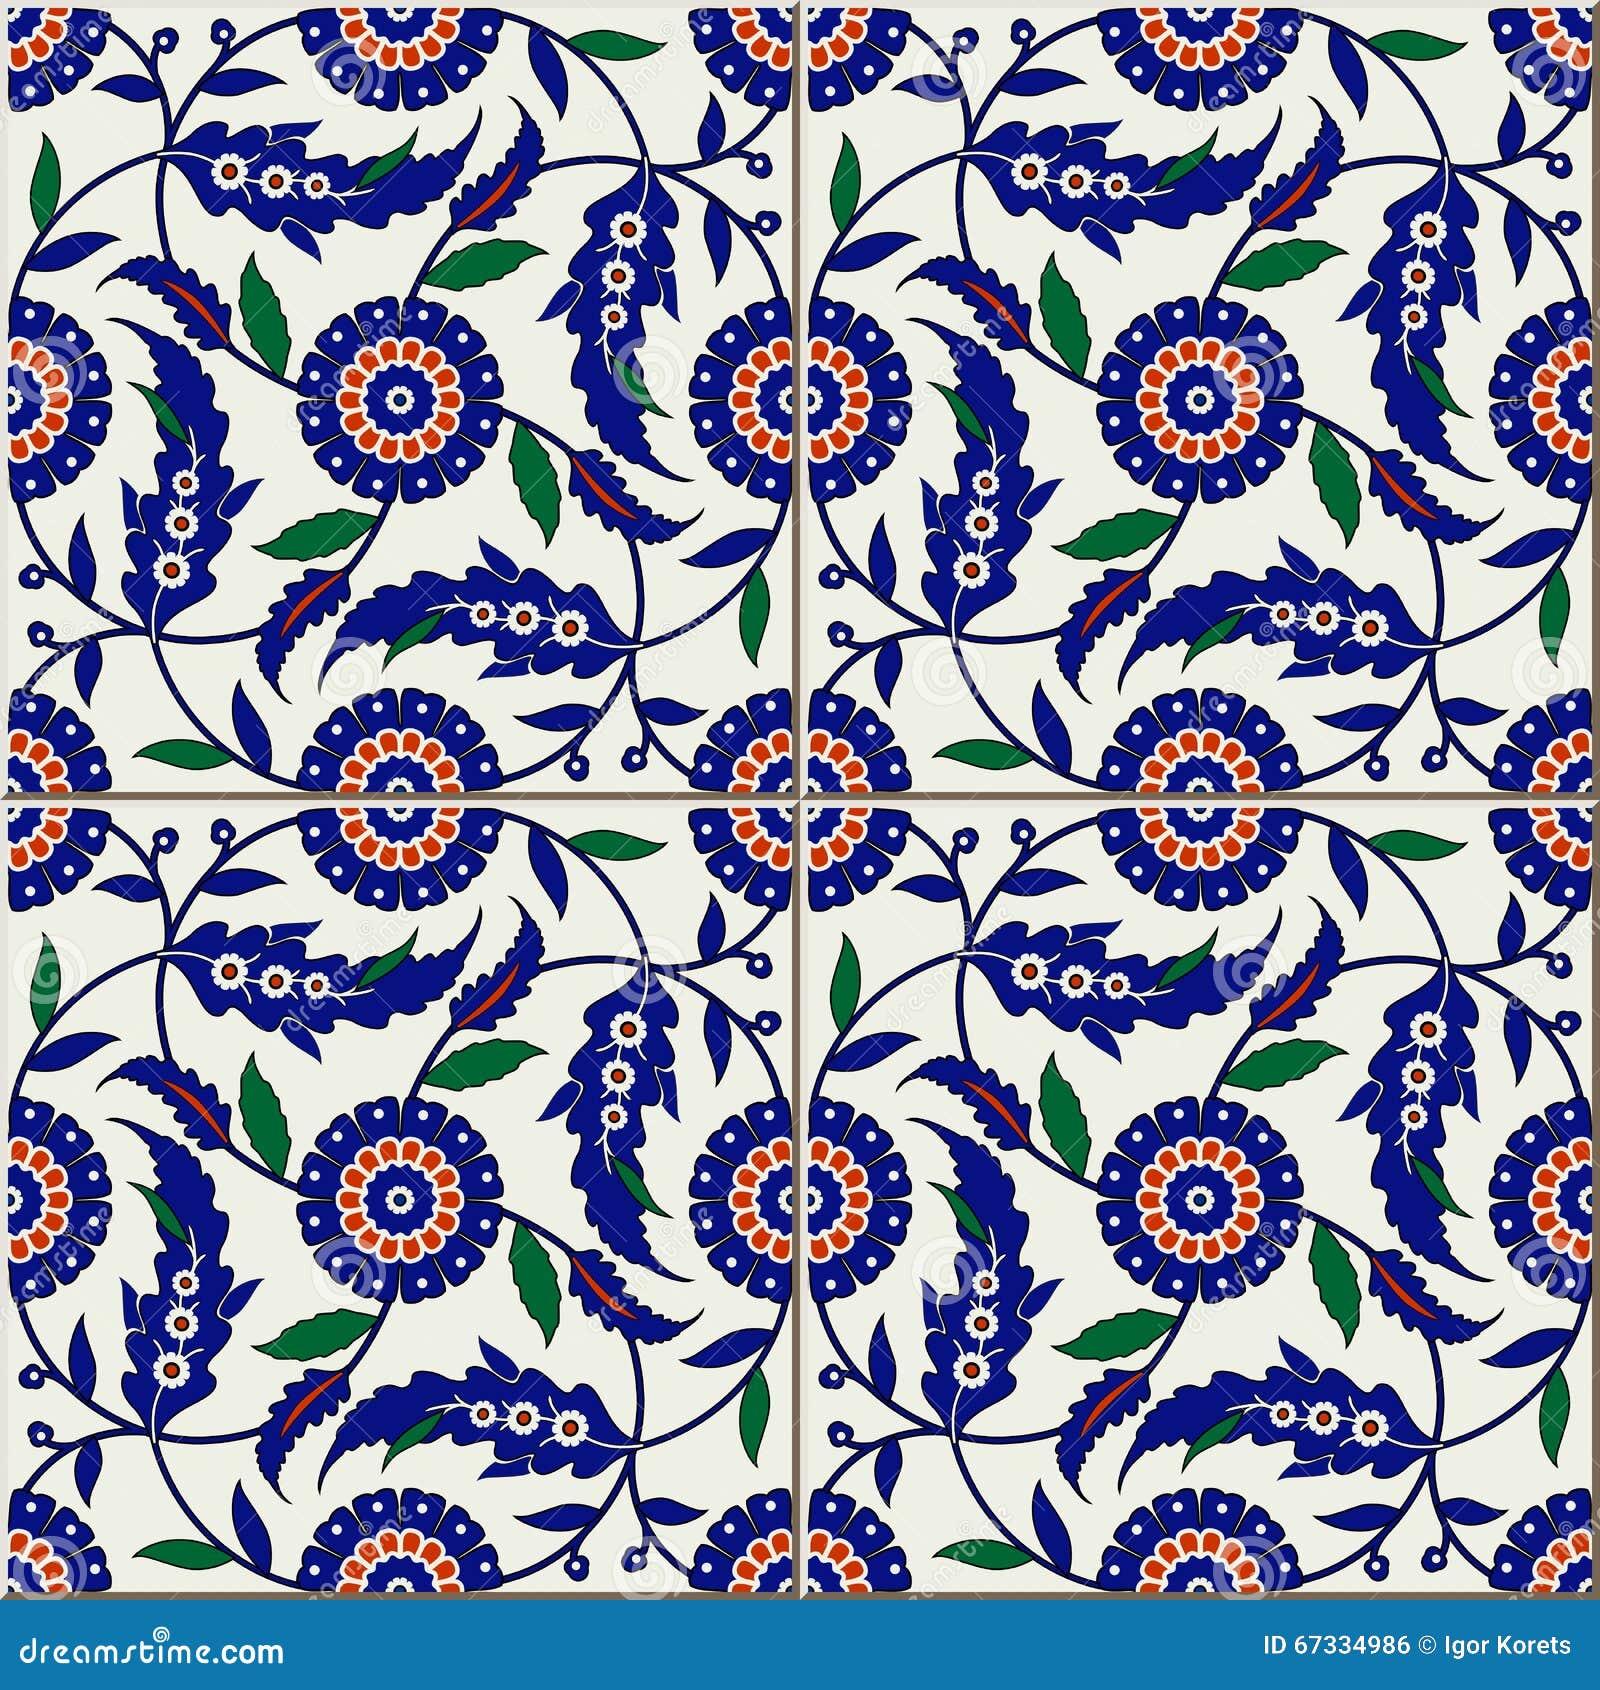 Ceramic Tile Tile Fireclay Tile Glass Expressions Tile 3